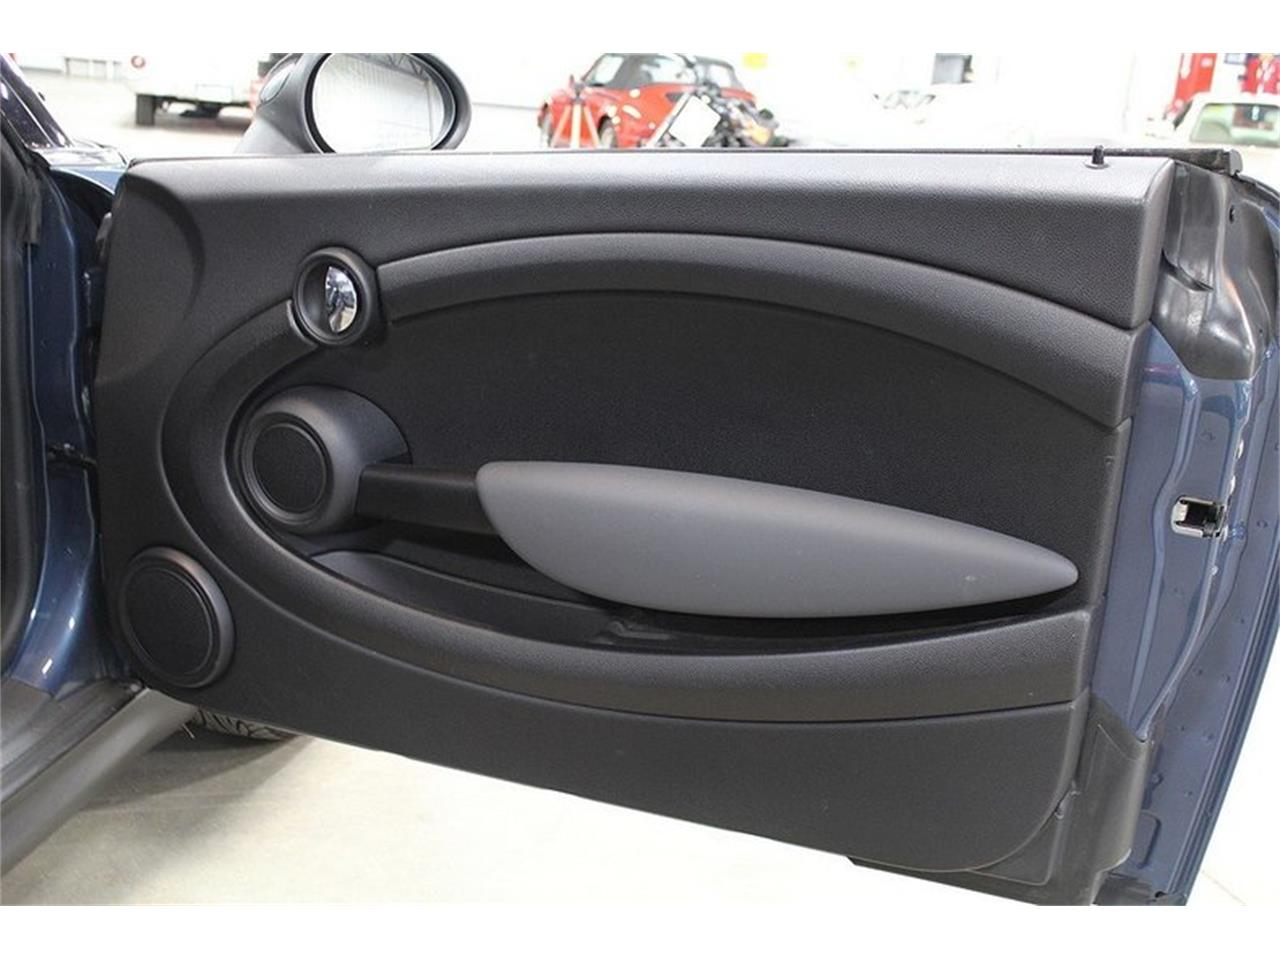 Large Picture of '10 MINI Cooper - $6,900.00 - L637